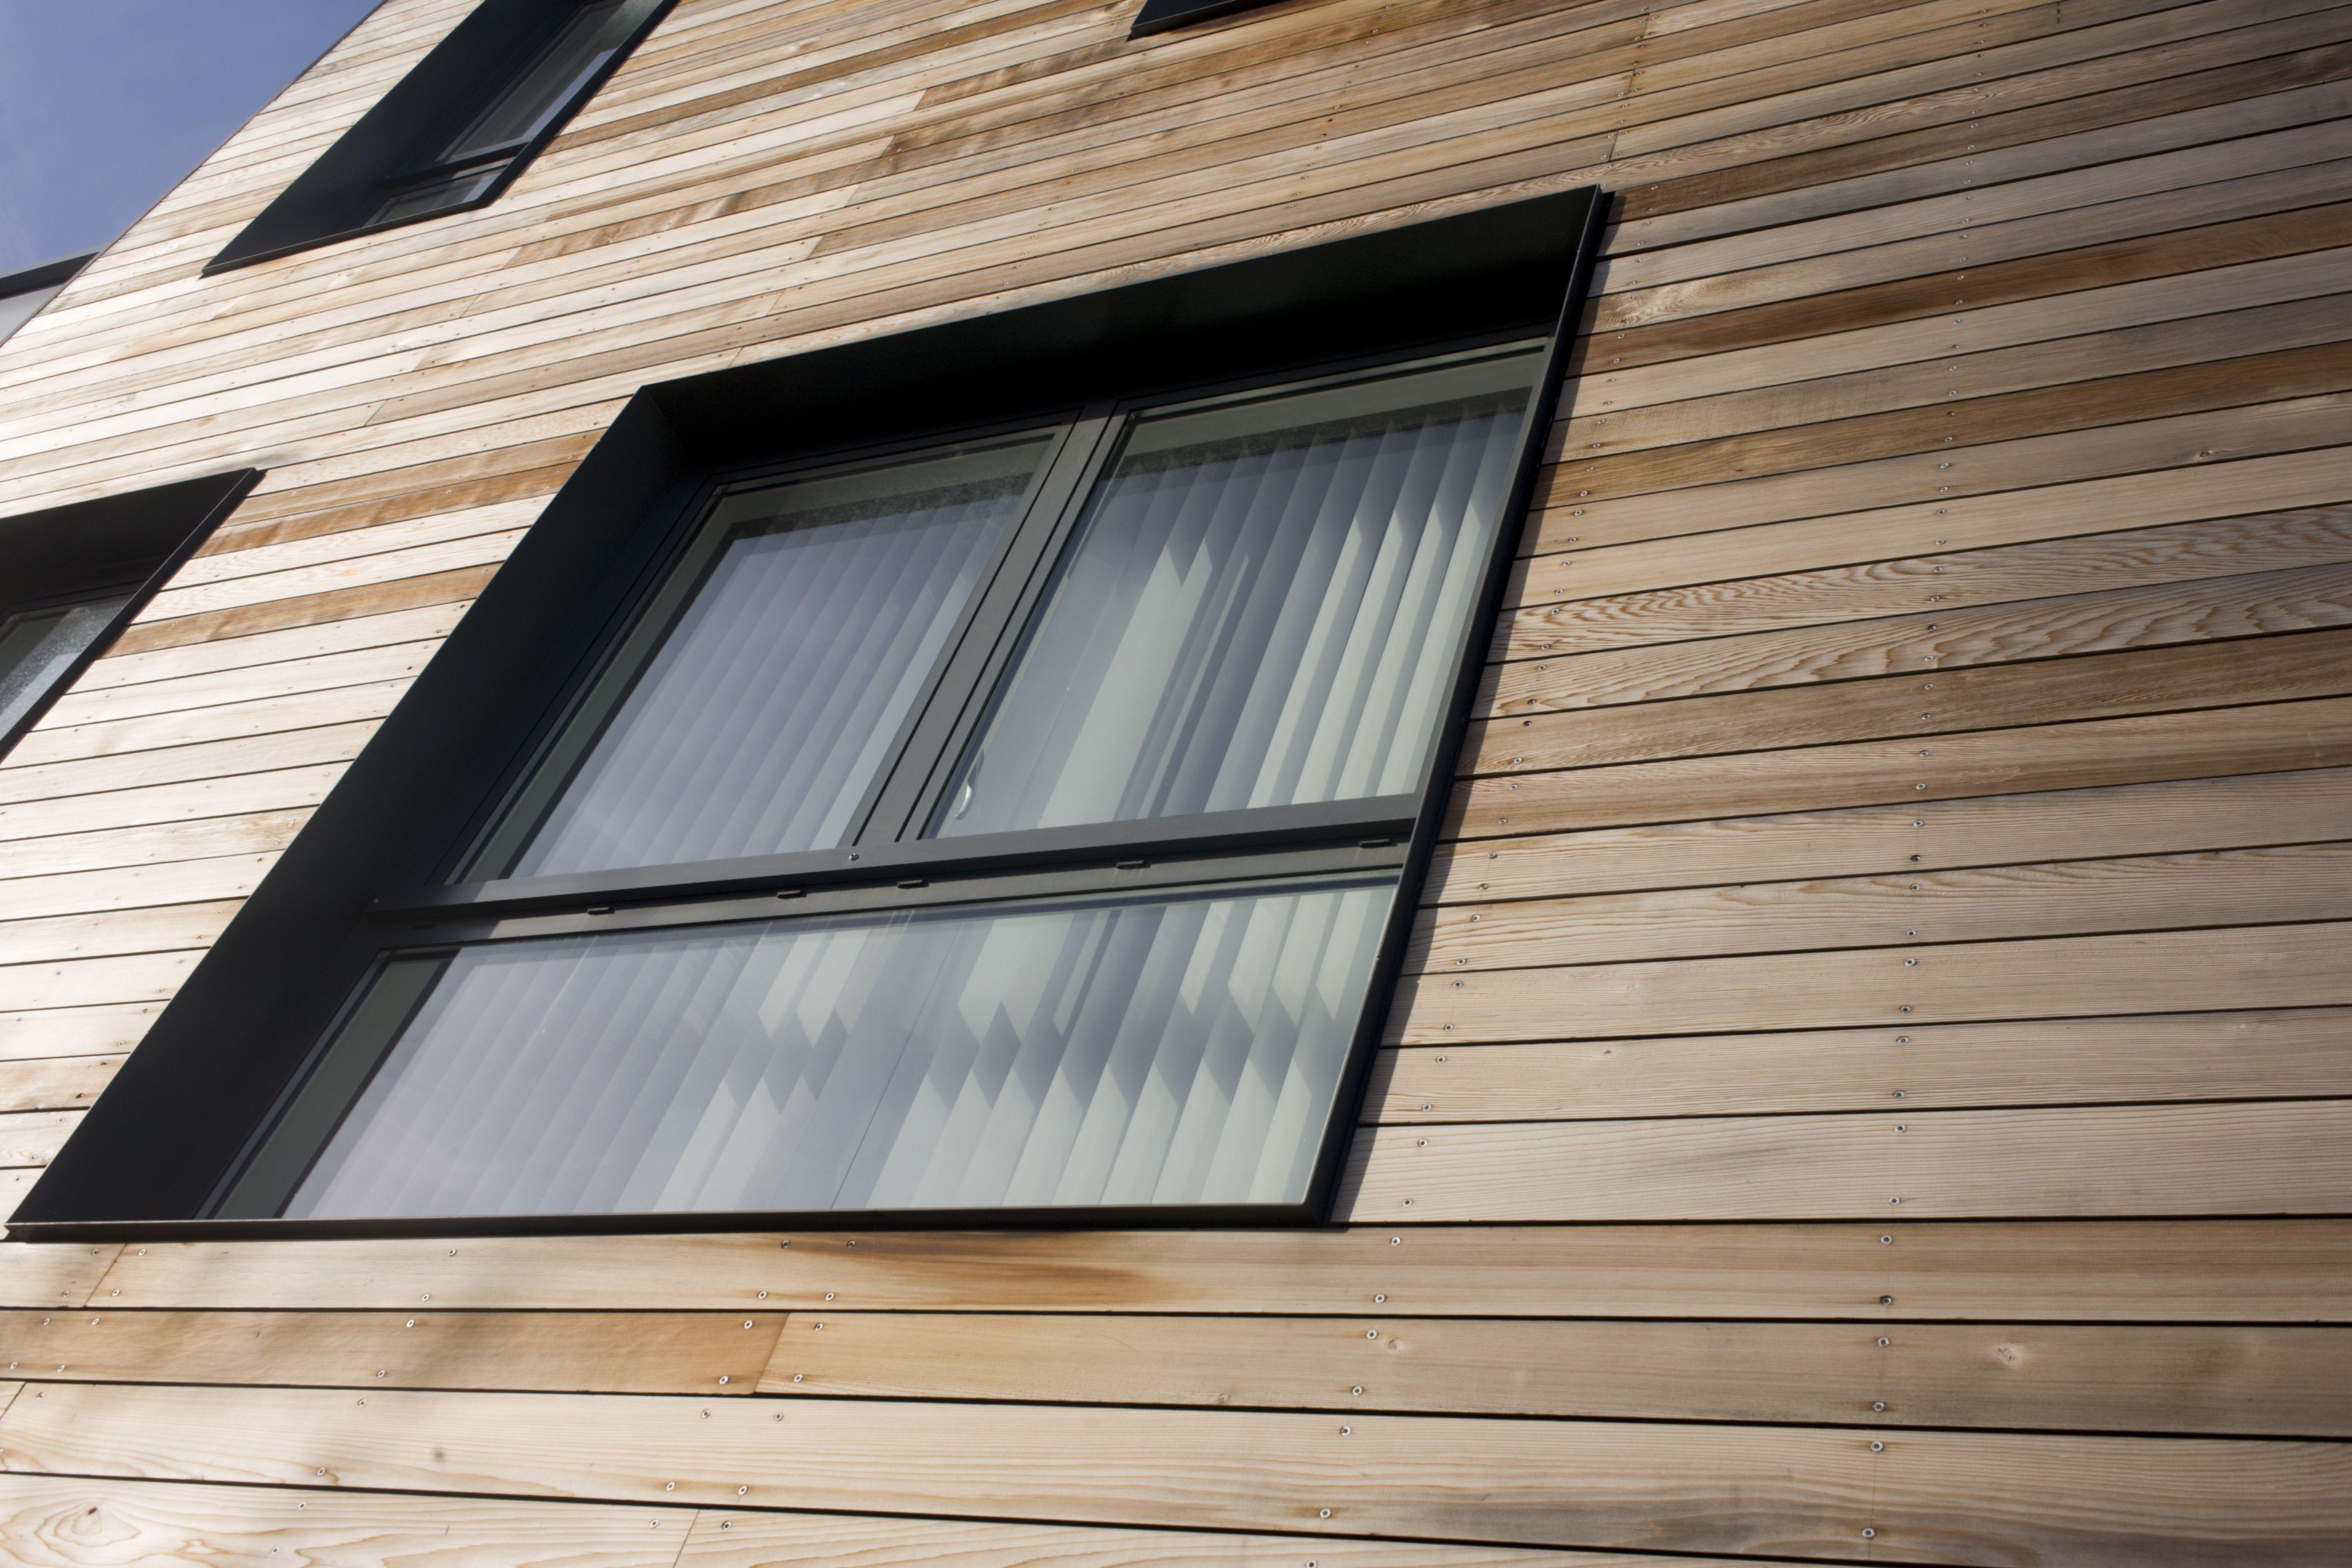 Ventana negra de tres paneles con revestimiento de madera natural